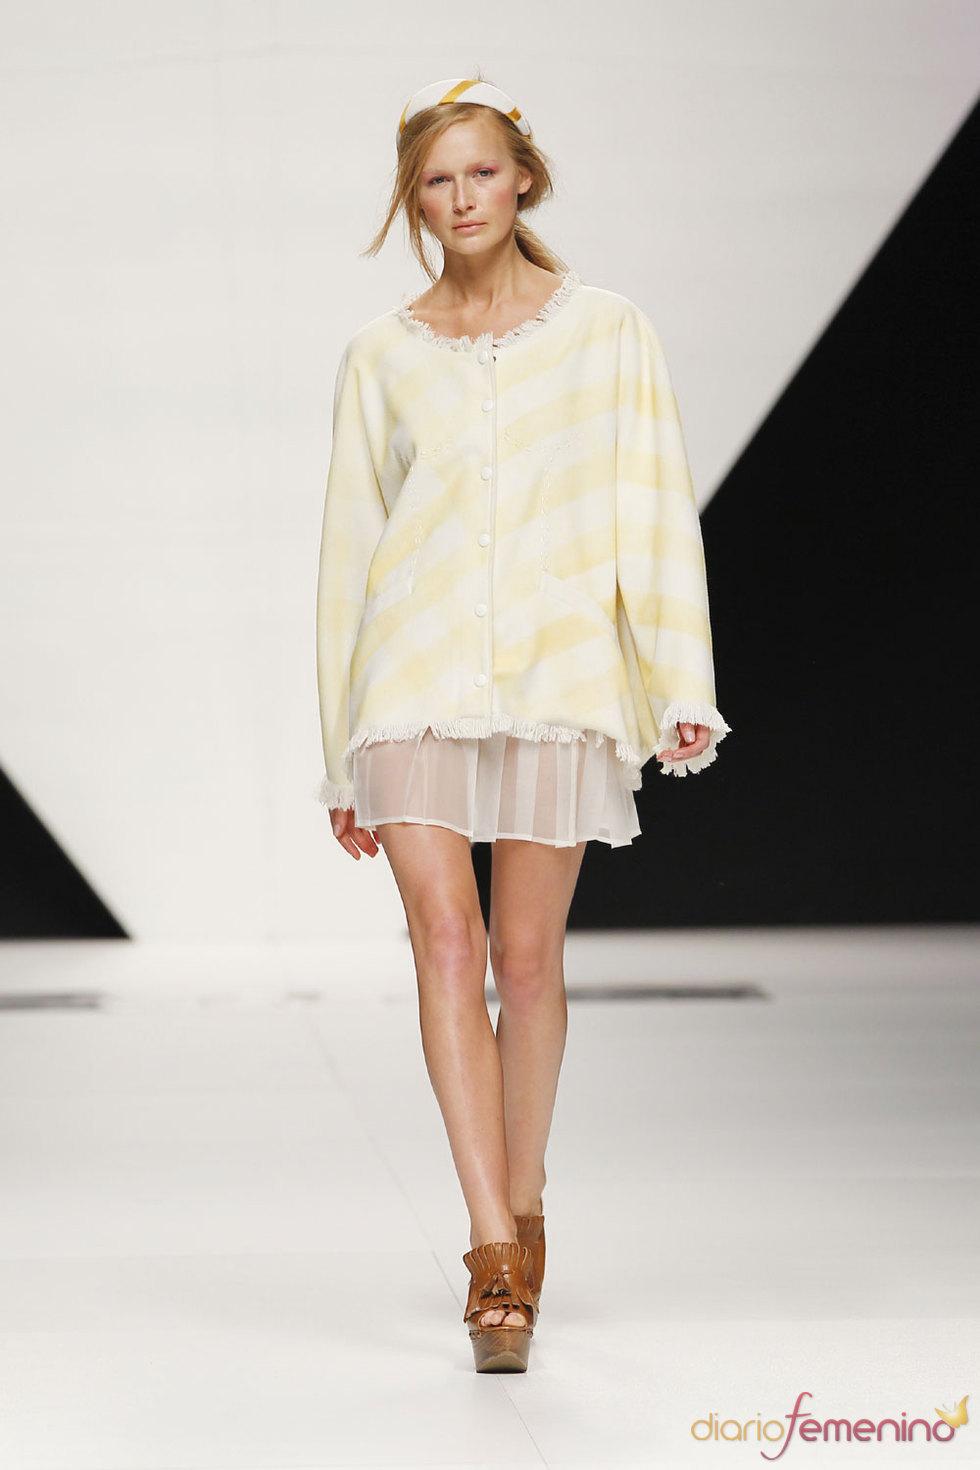 Cibeles Madrid Fashion Week 2010: American Perez